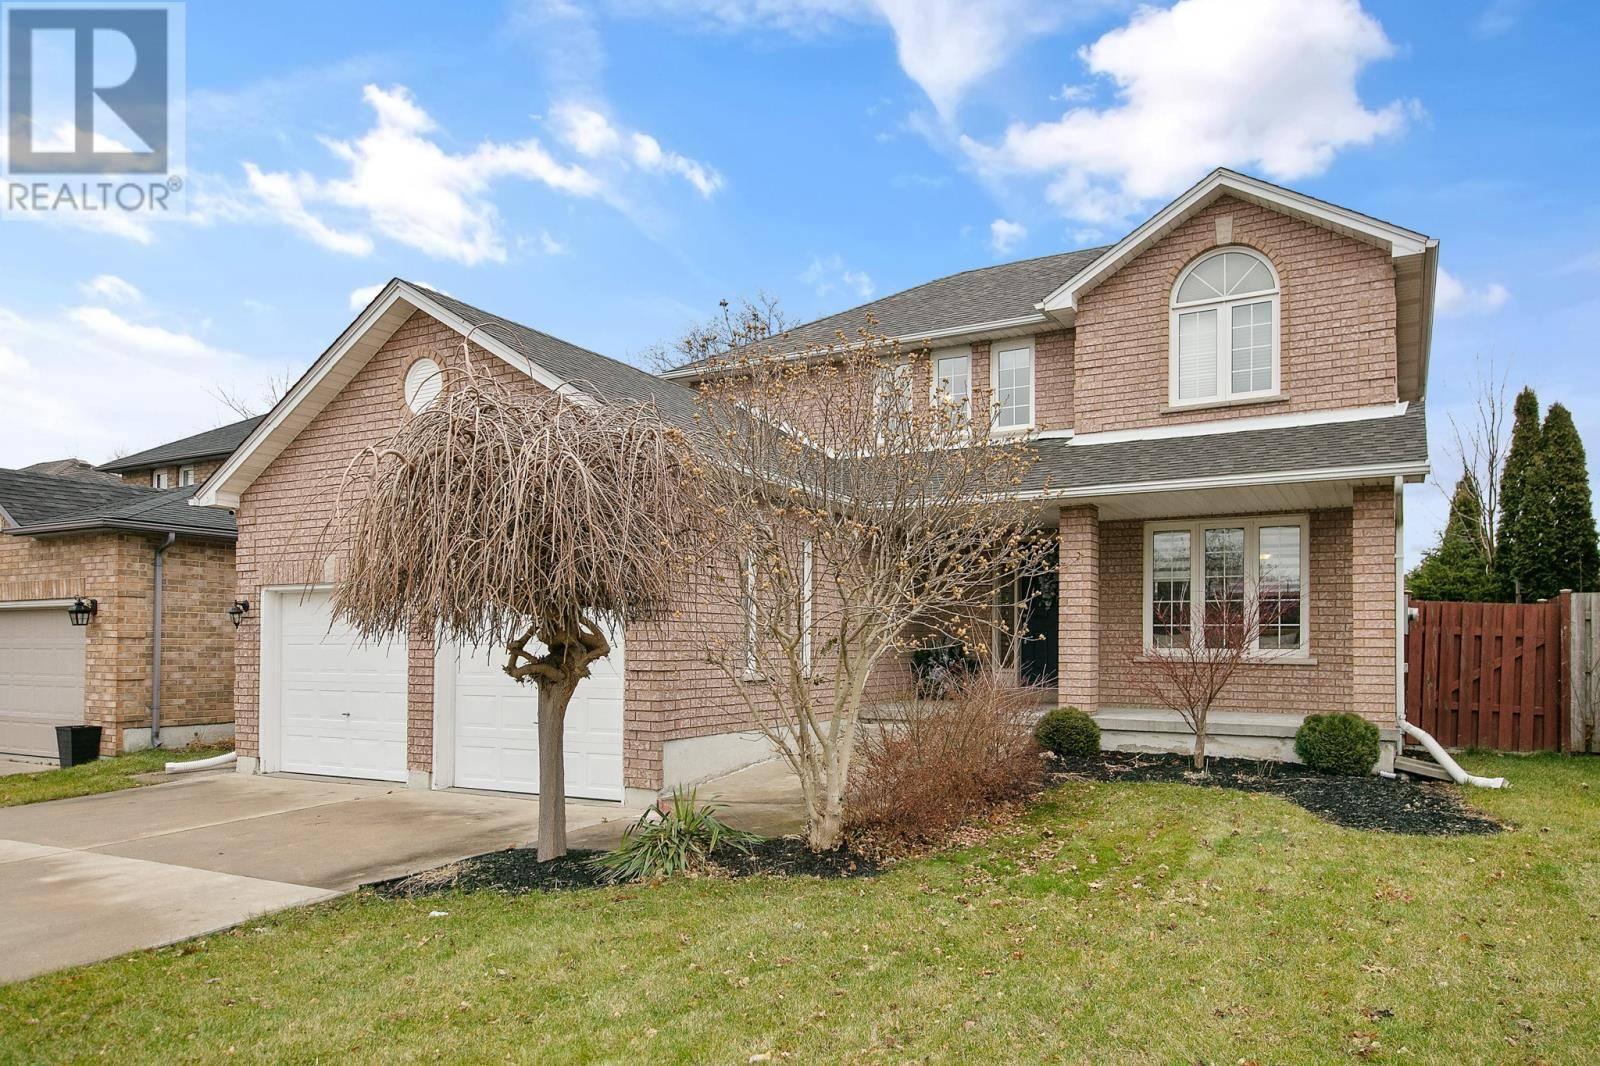 House for sale at 1510 Heatherglen Dr Tecumseh Ontario - MLS: 19029054